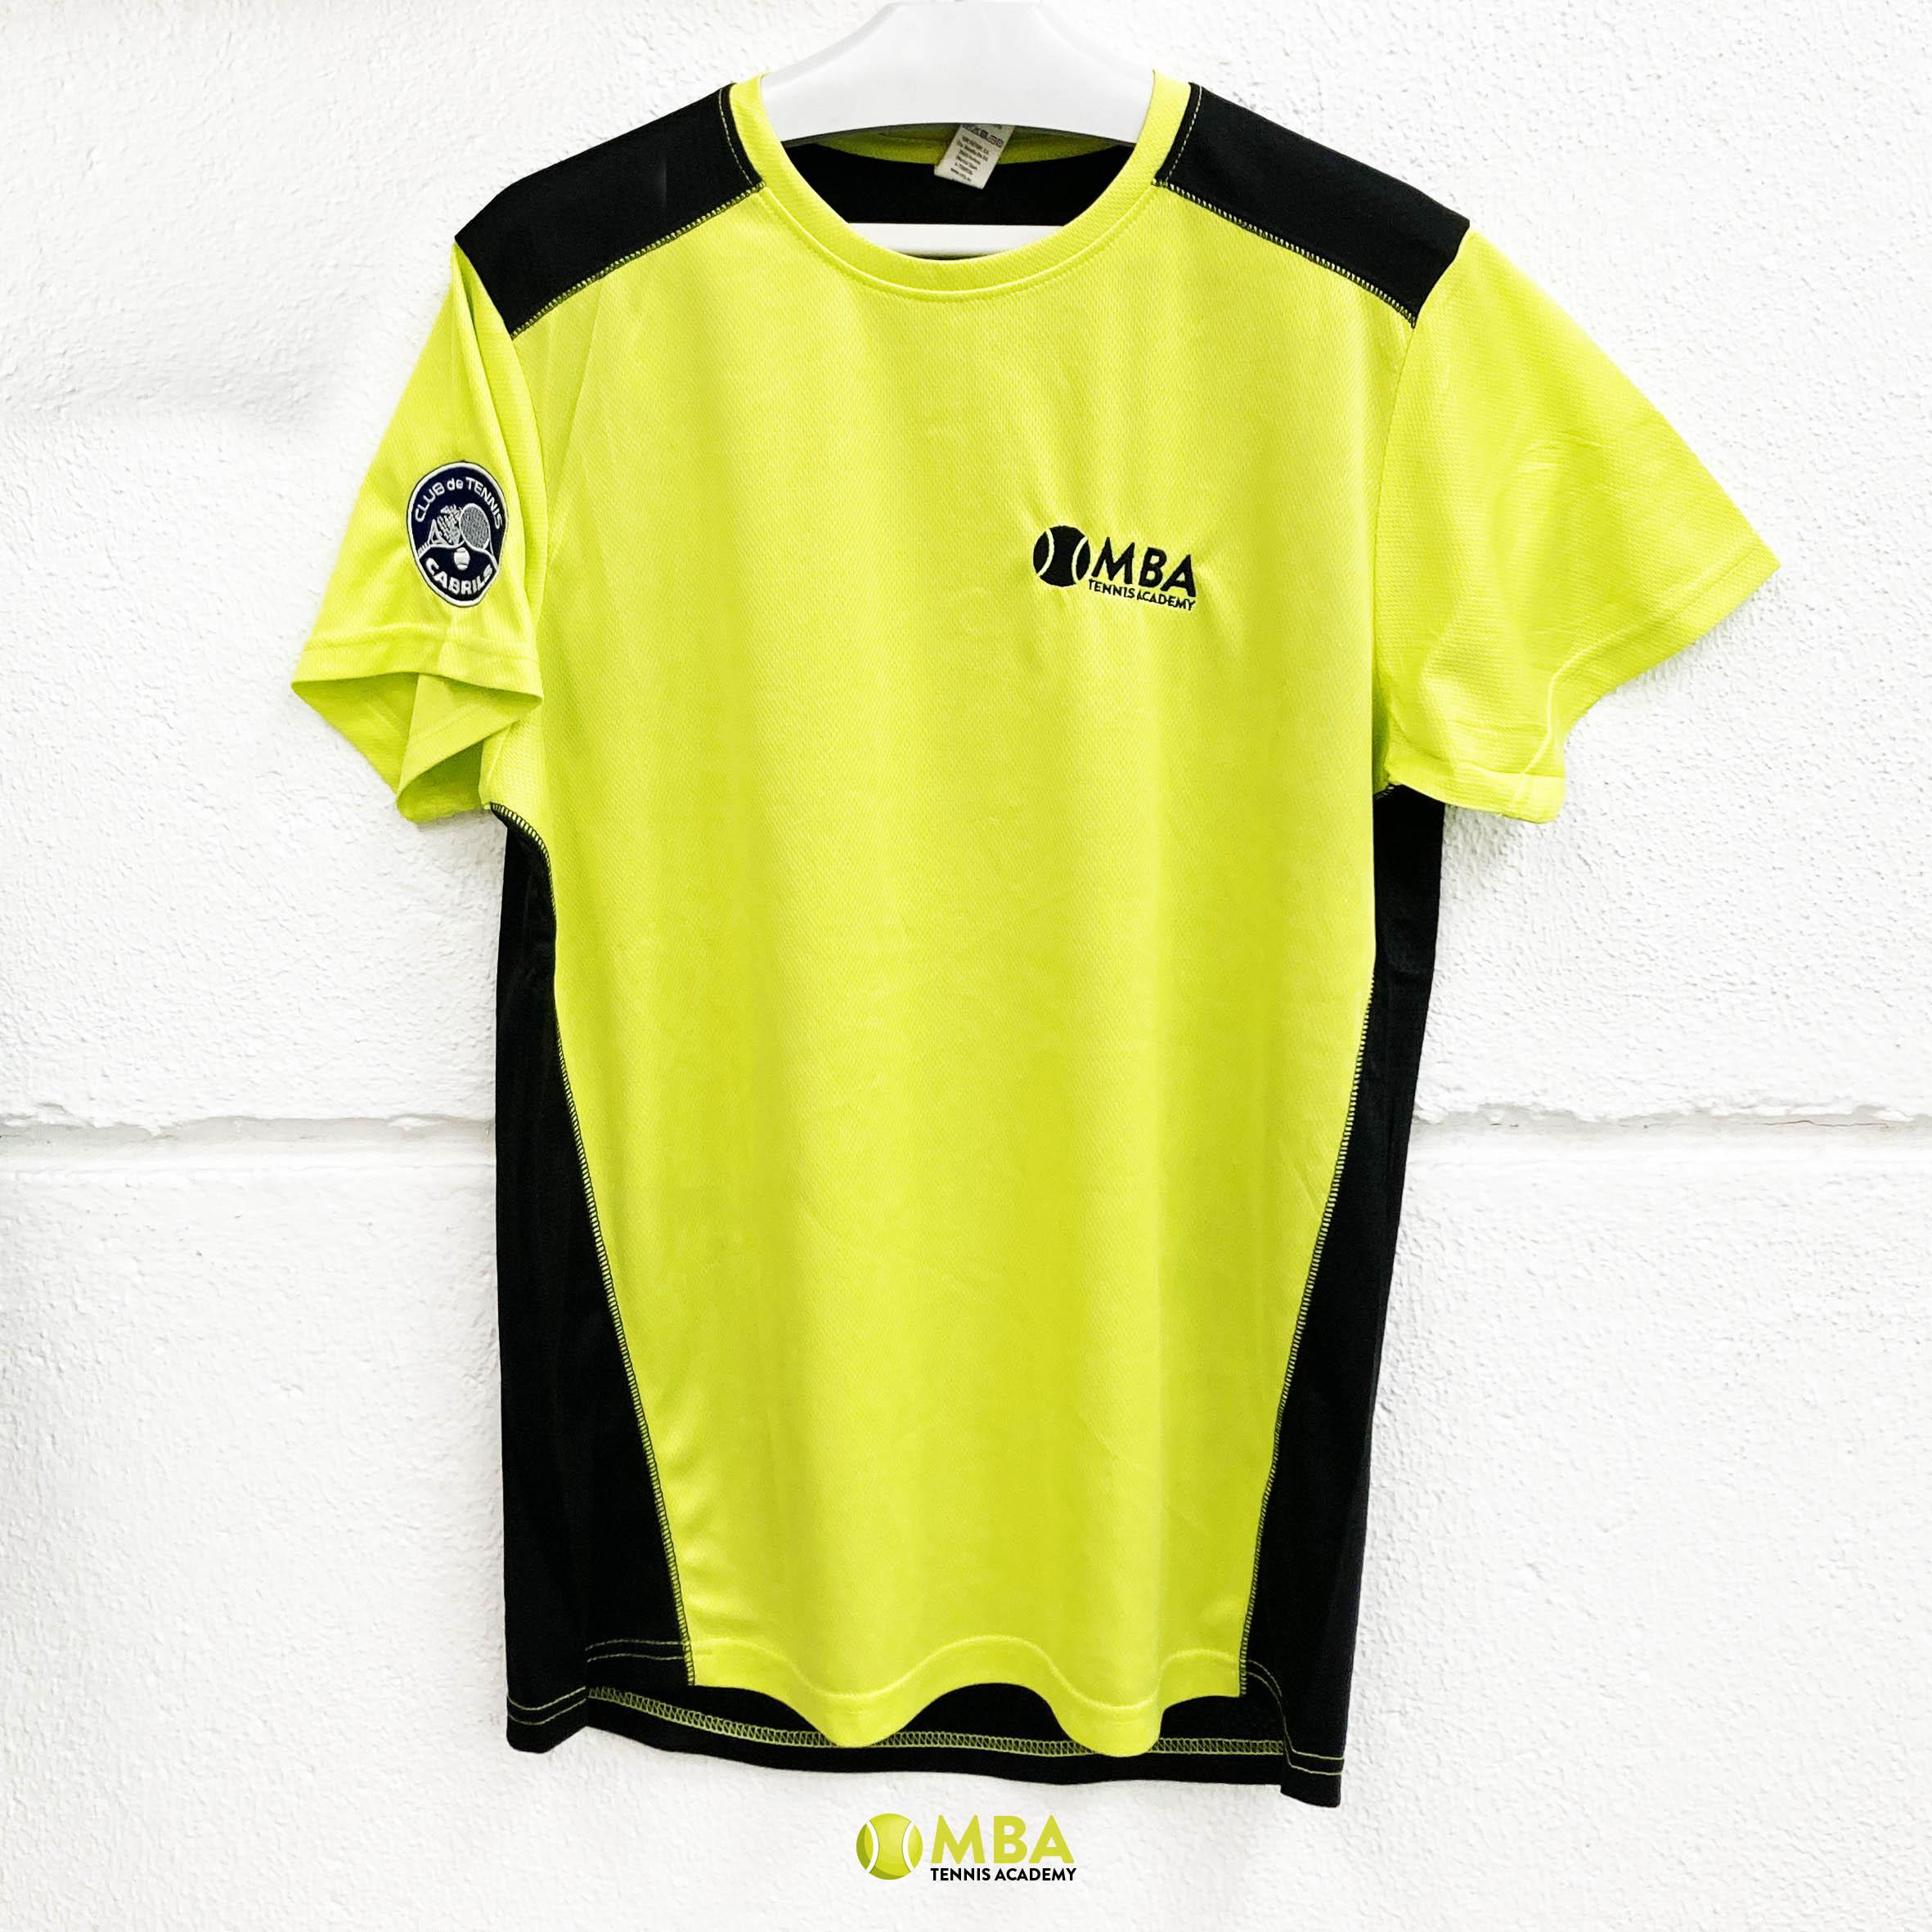 MBA-Tennis-Academy--camiseta-lima-hombre-manga-corta-1